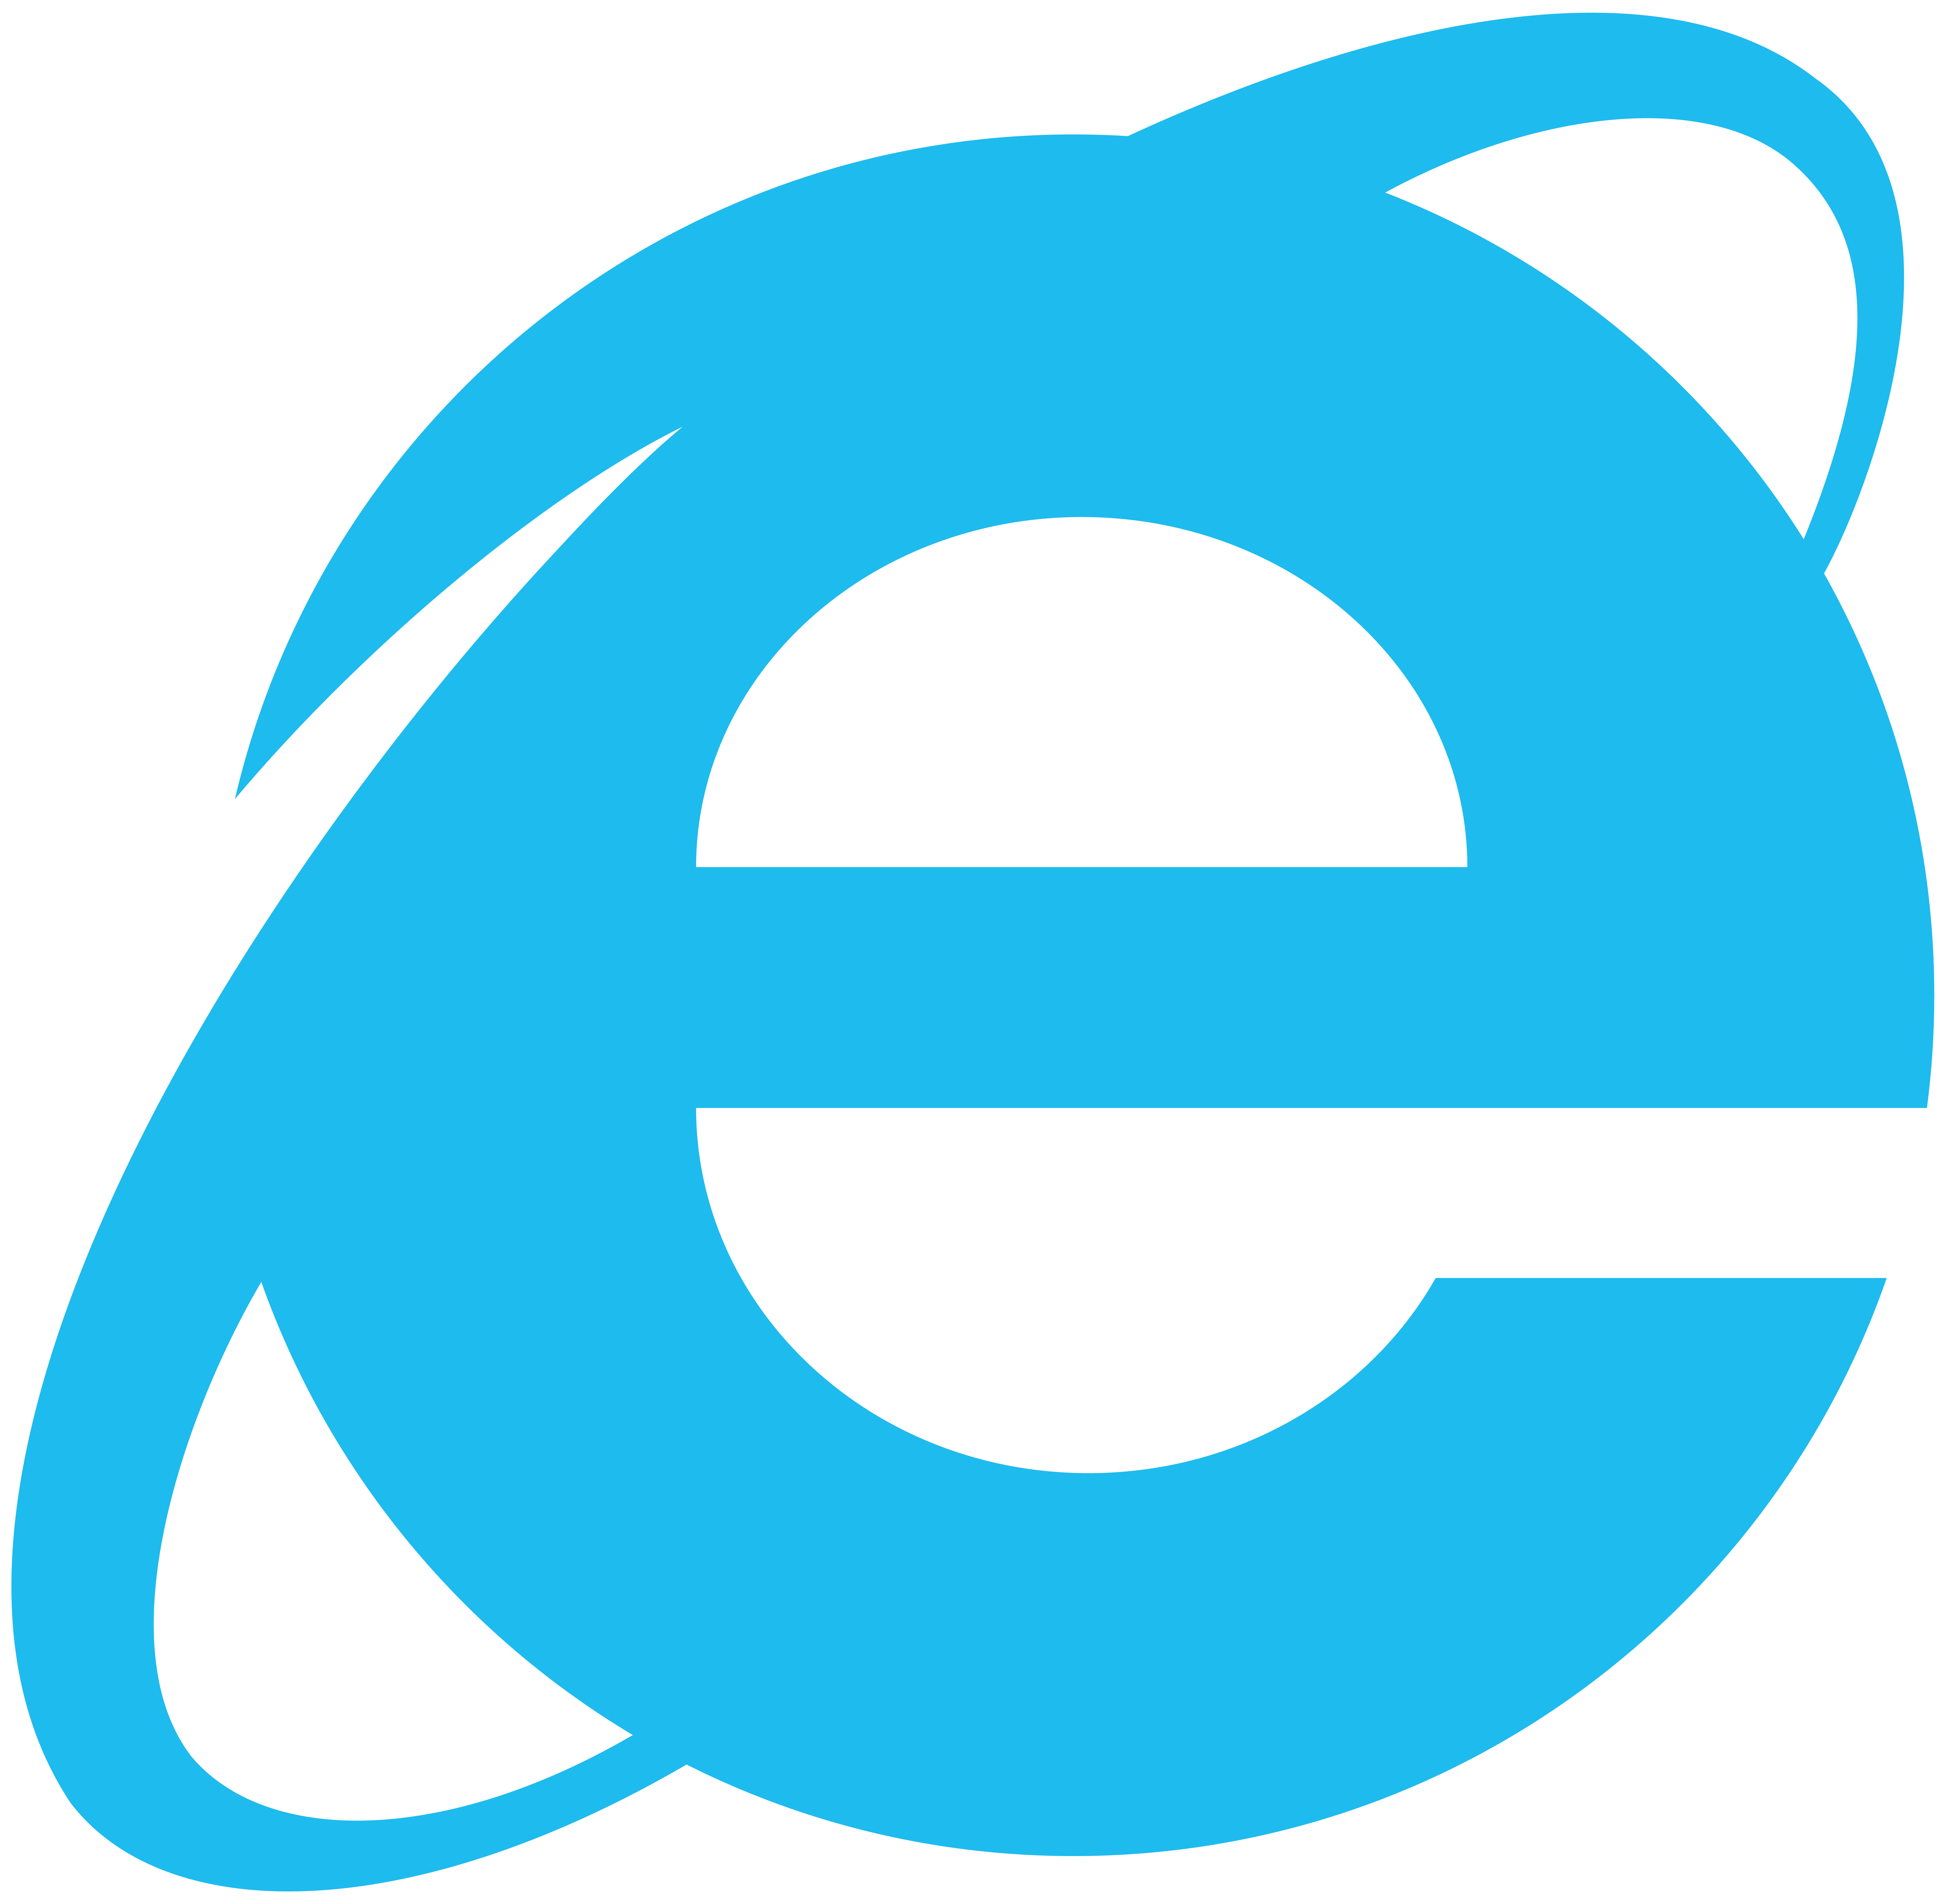 Internet Explorer Simplistic Logo, Vector by Luchocas on ...